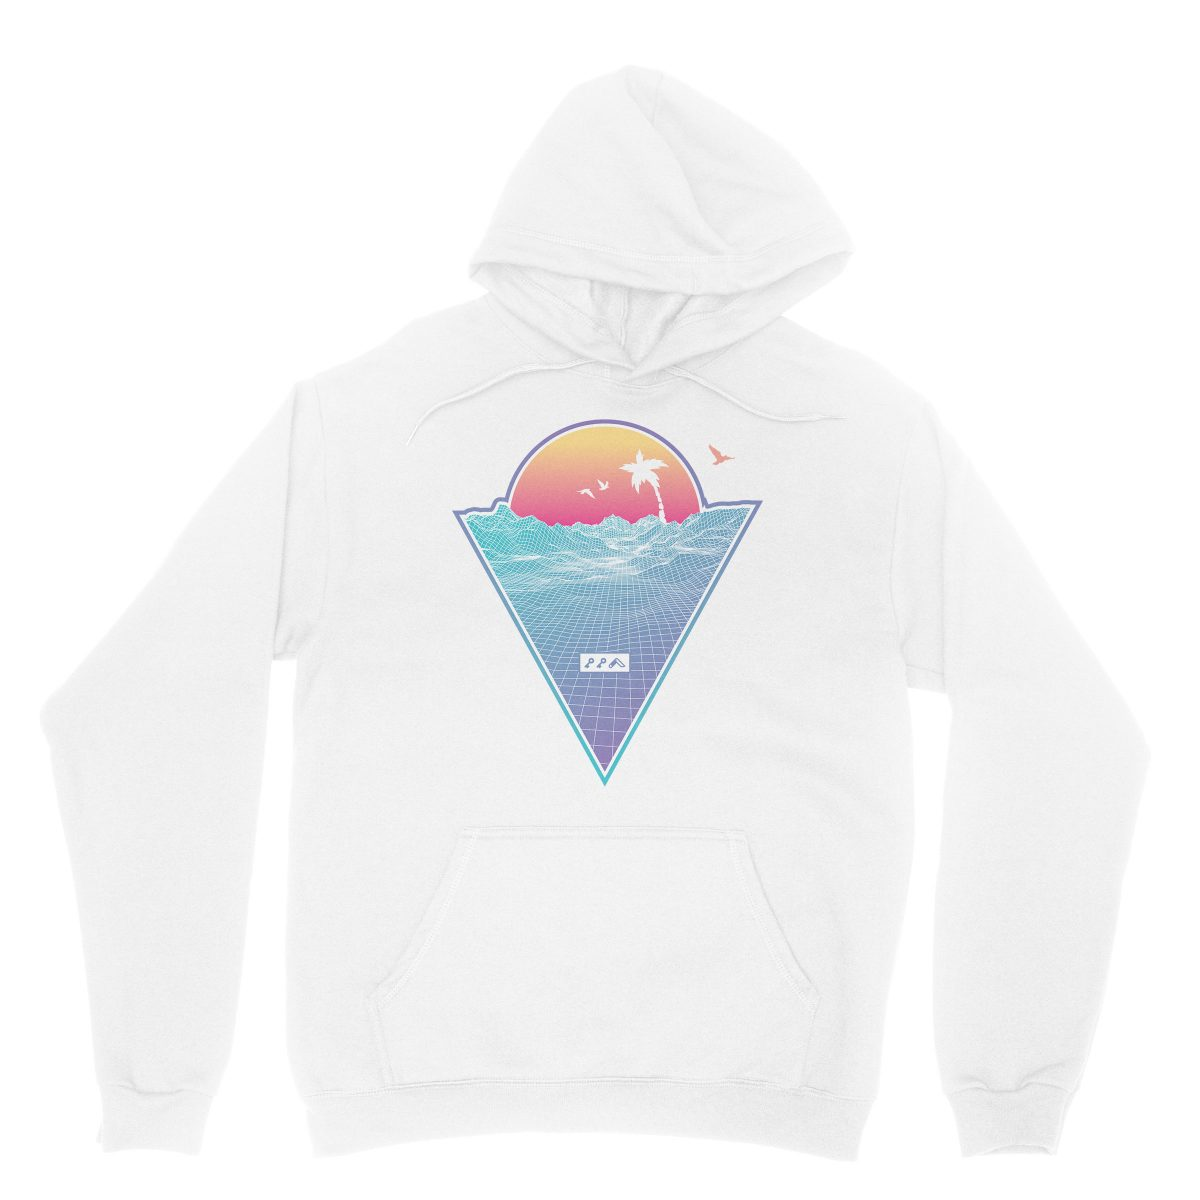 """OFF THE GRID"" cali vibes retro 80s design hoodie sweatshirts white by kikicutt"